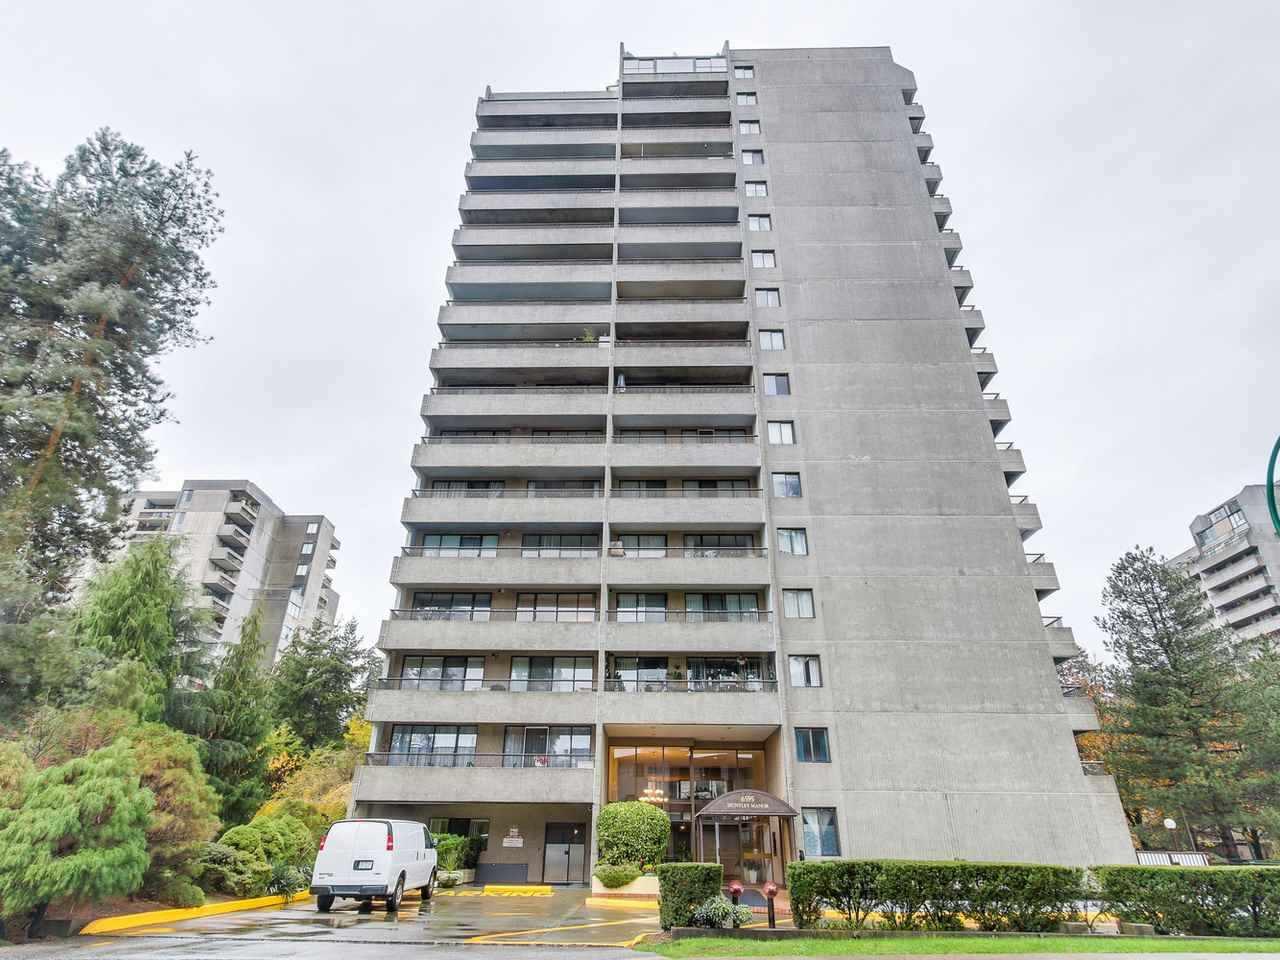 Condo Apartment at 207 6595 WILLINGDON AVENUE, Unit 207, Burnaby South, British Columbia. Image 1